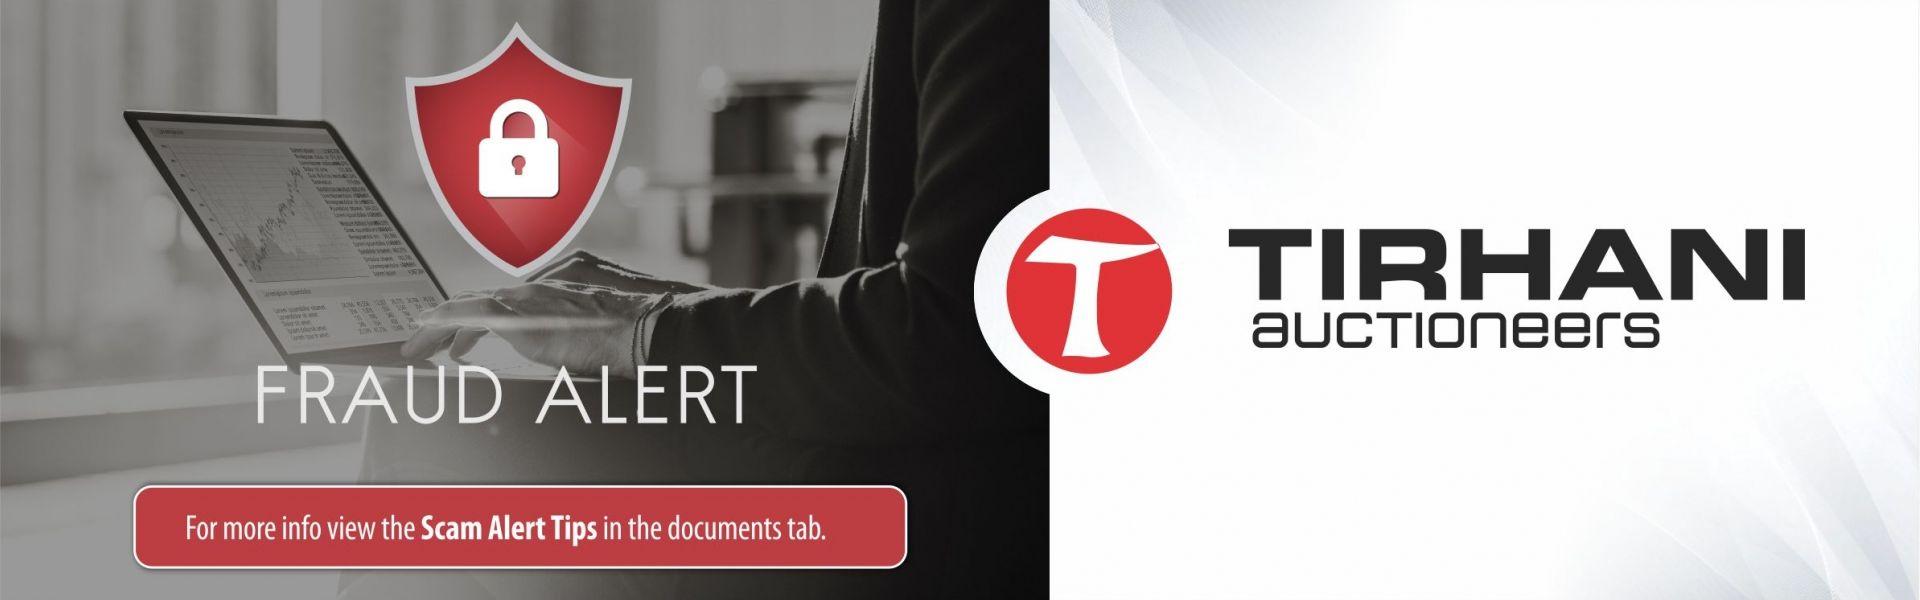 Fraud alert website op1